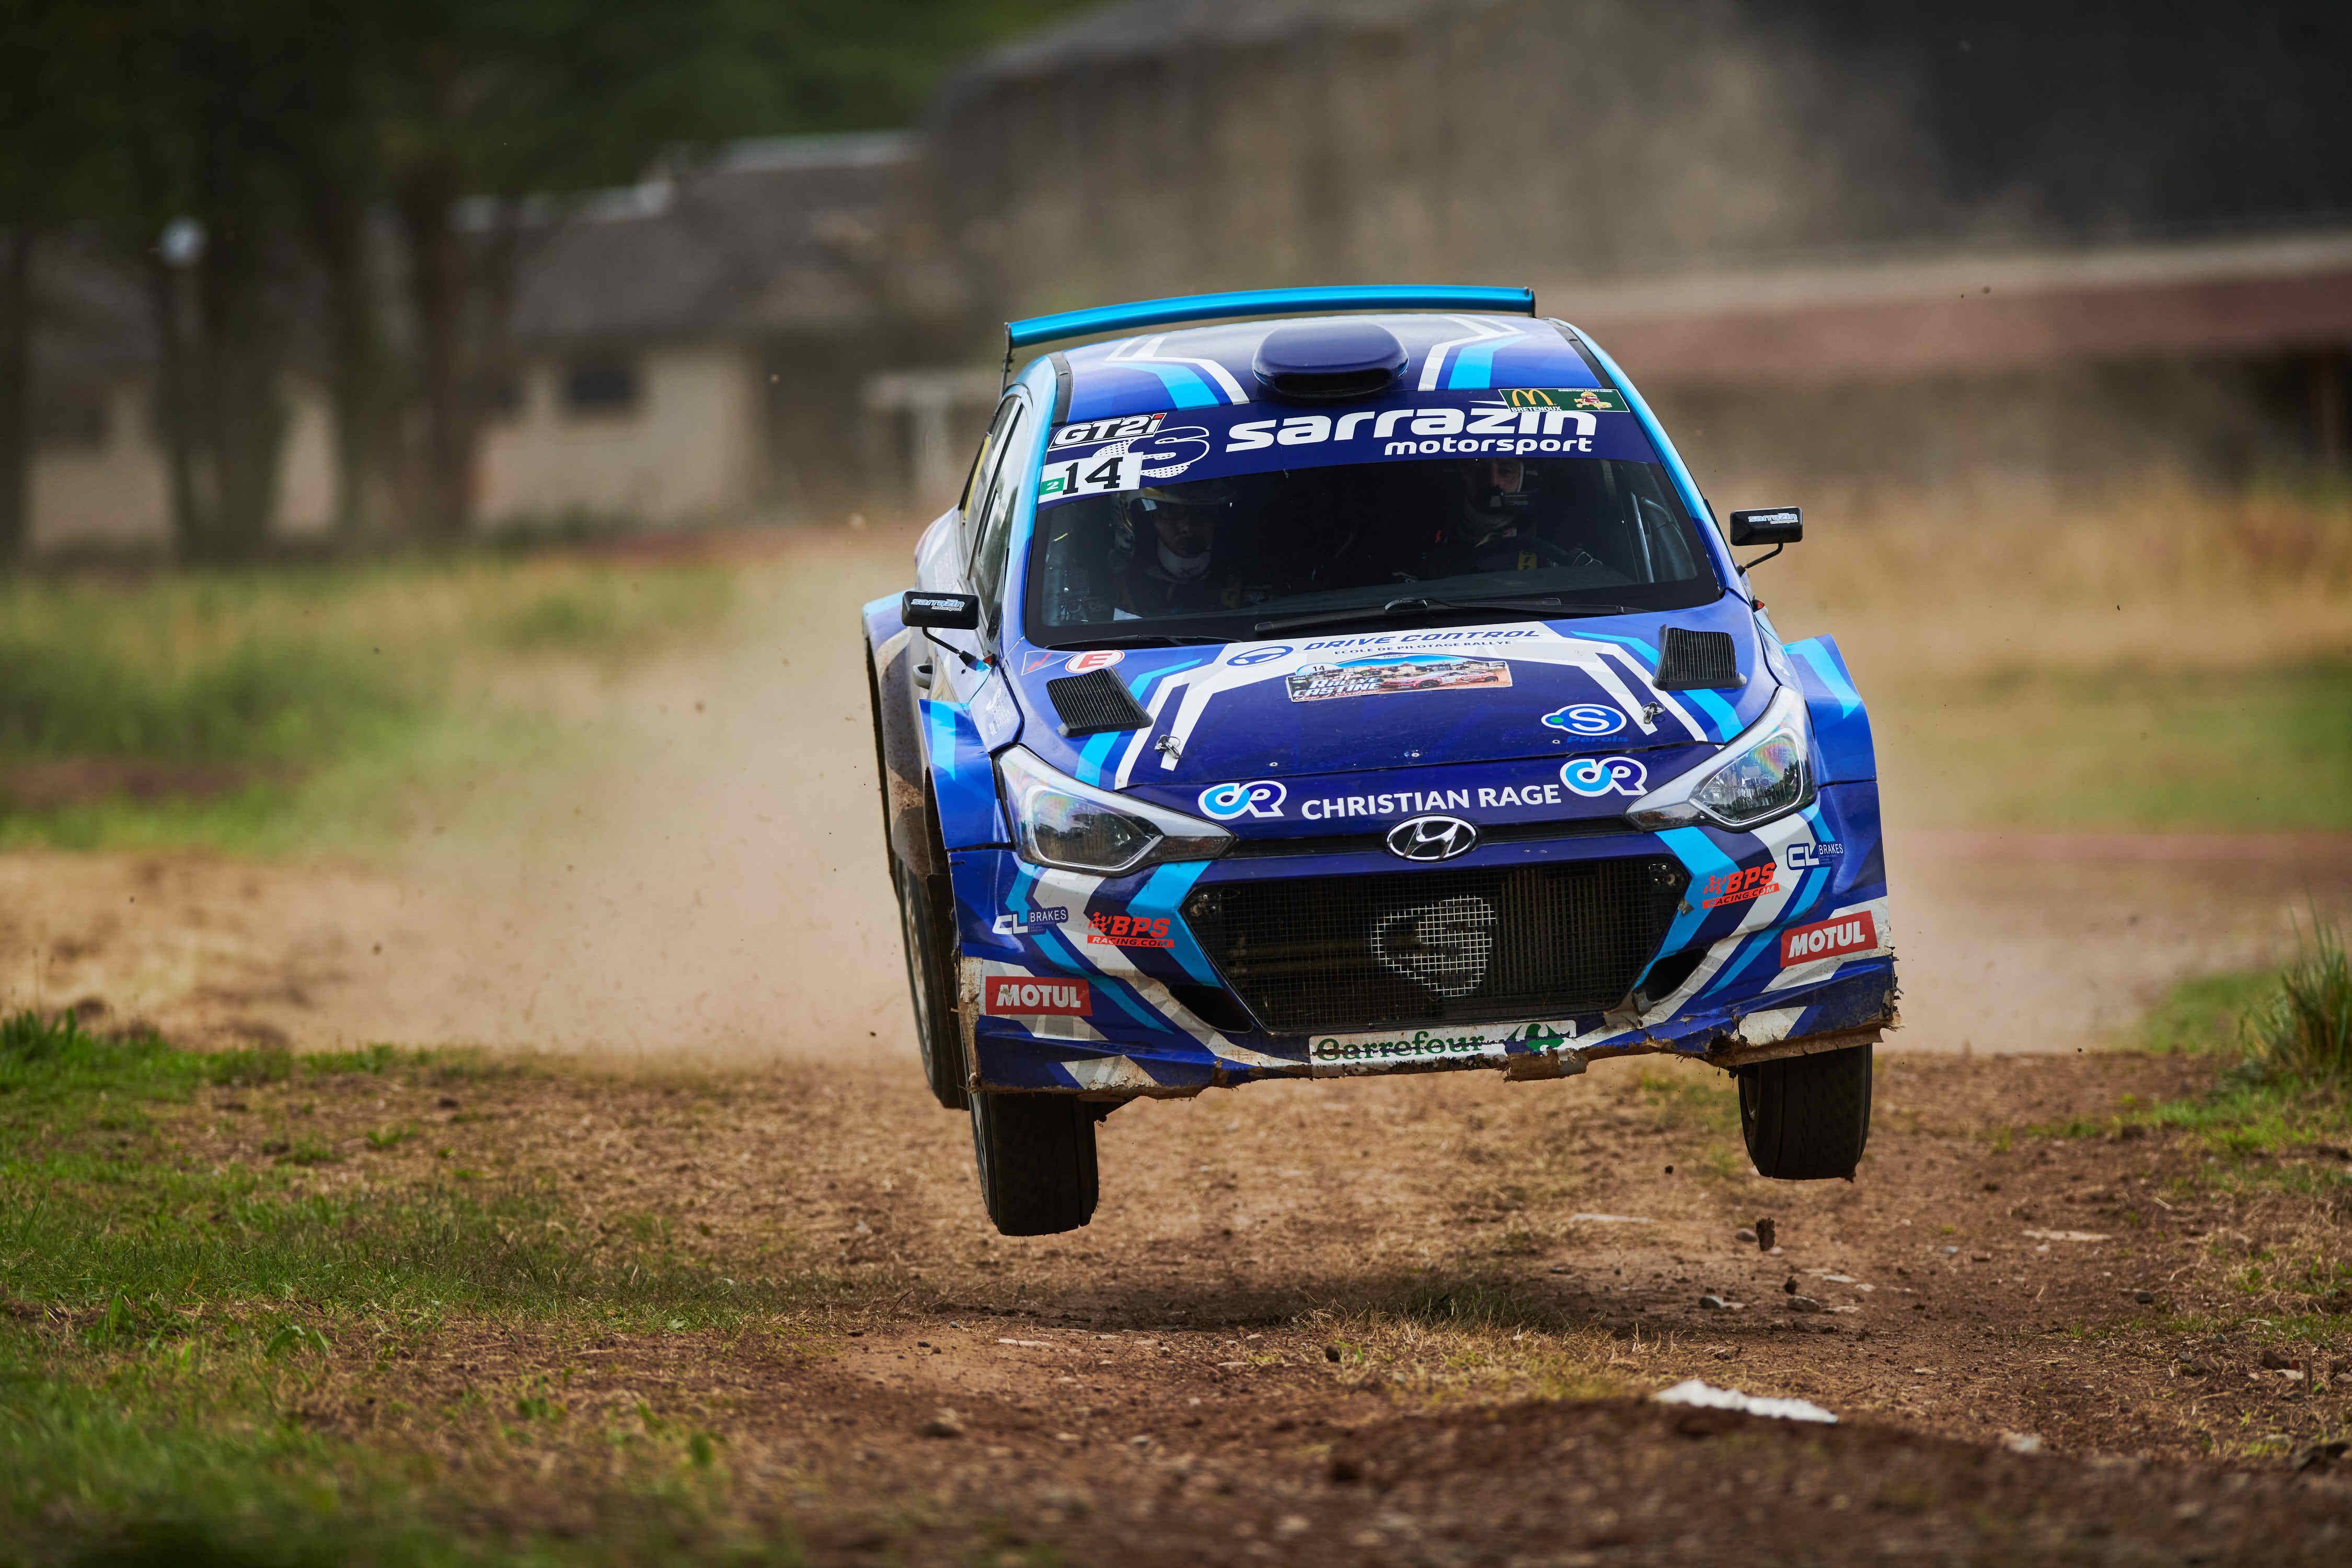 Benjamin Clemencon - Rallye Castine